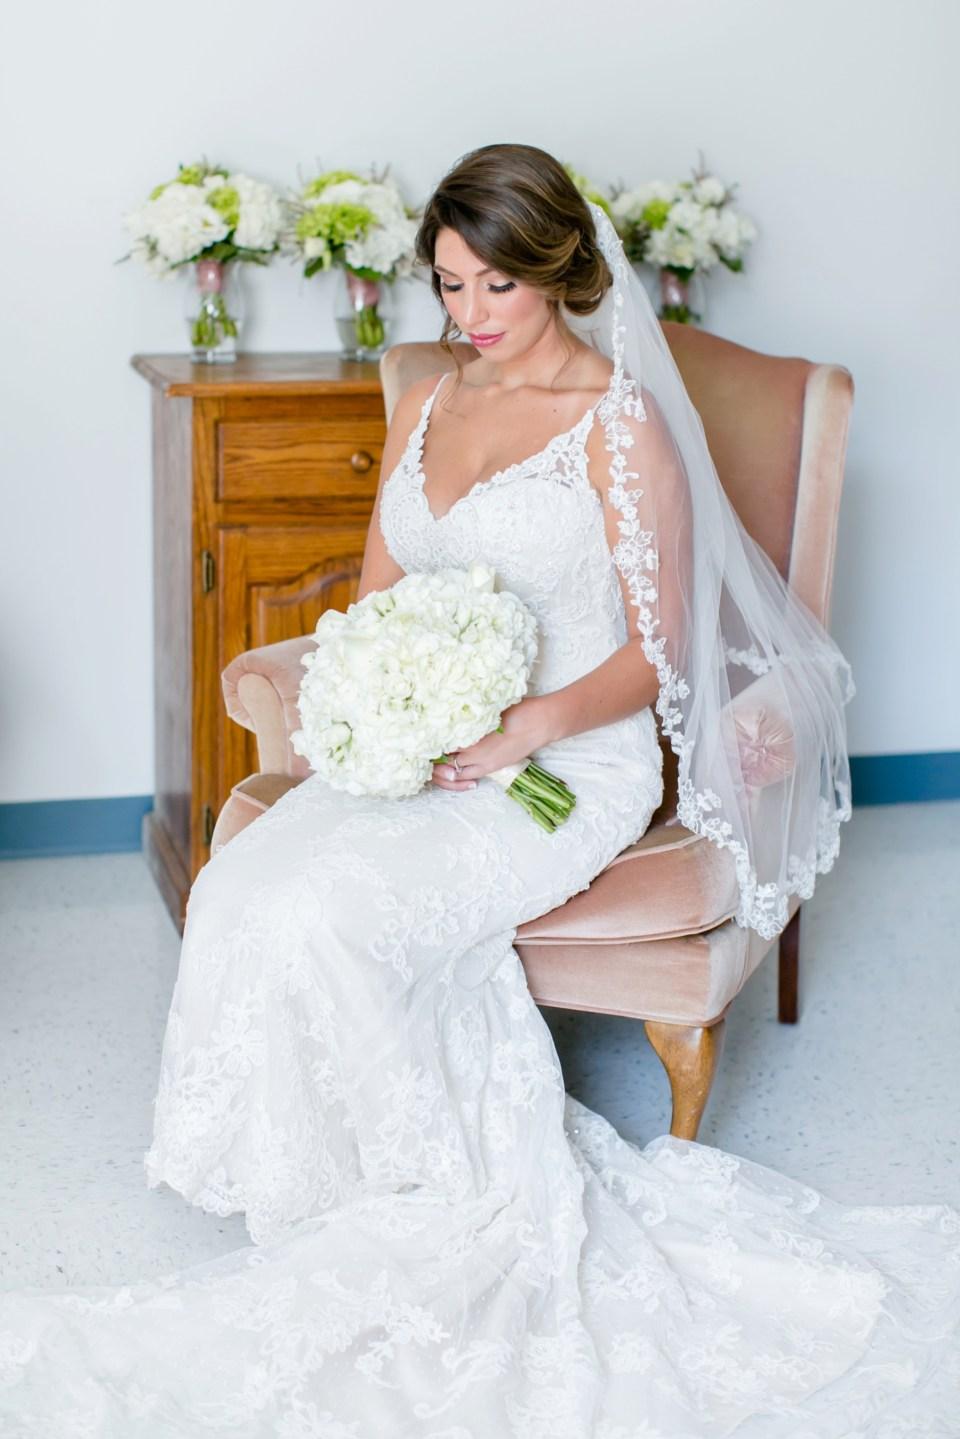 11A-Inn-At-The-Olde-Silk-Mill-Wedding-Summer-Anna-Ian-1030